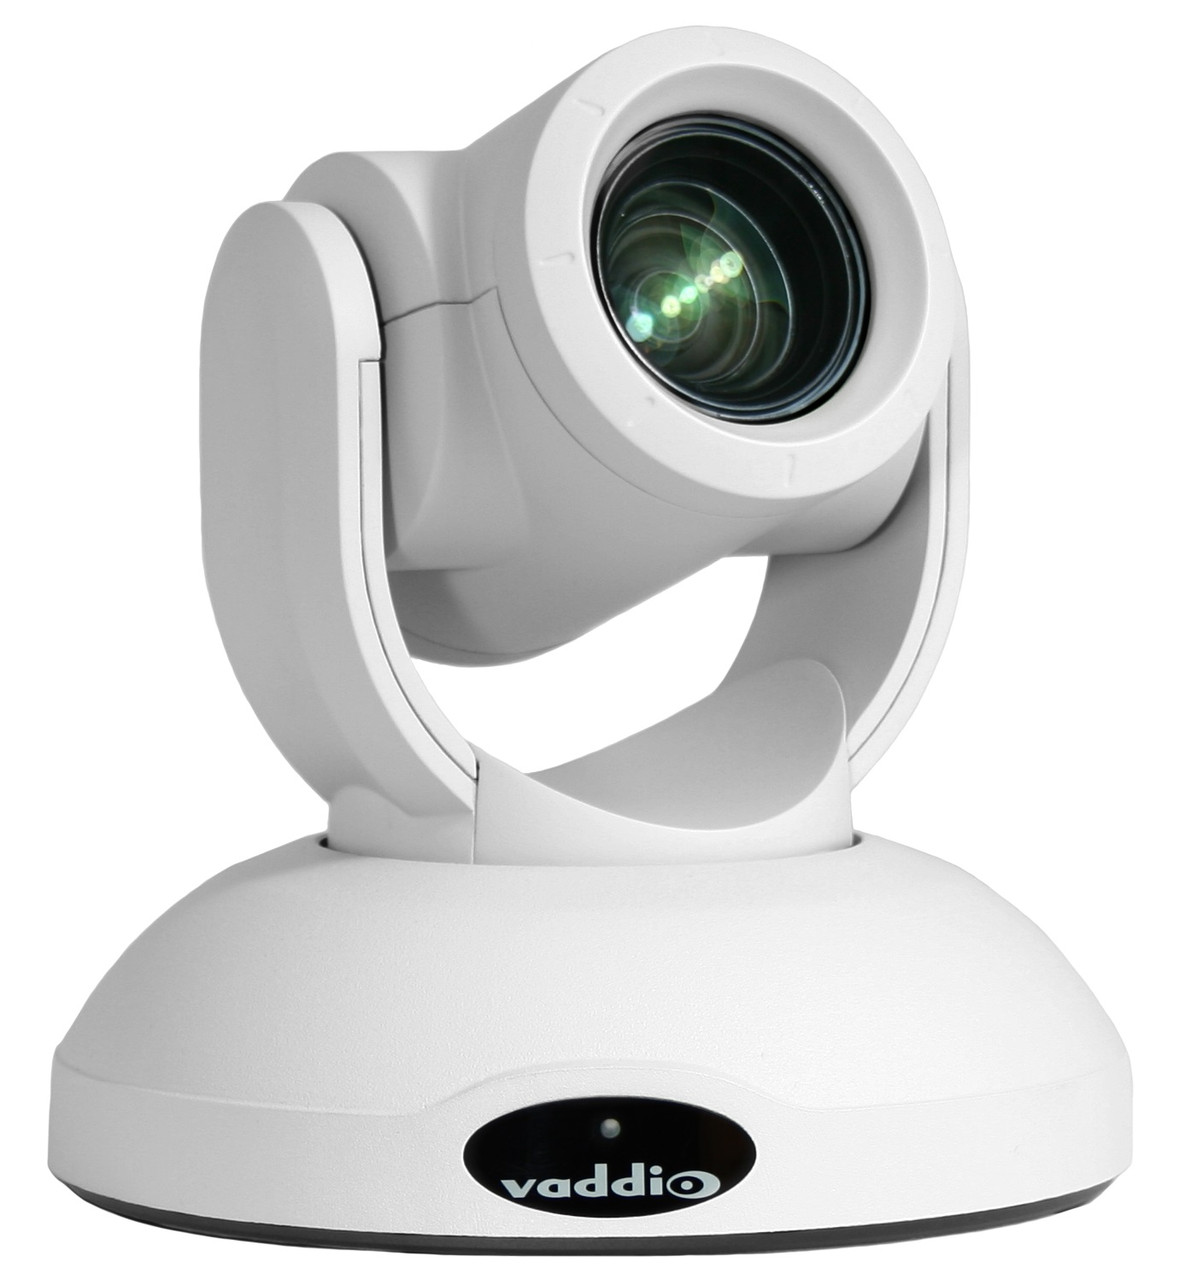 RoboSHOT 20 UHD Ultra High Definition PTZ Camera (white)